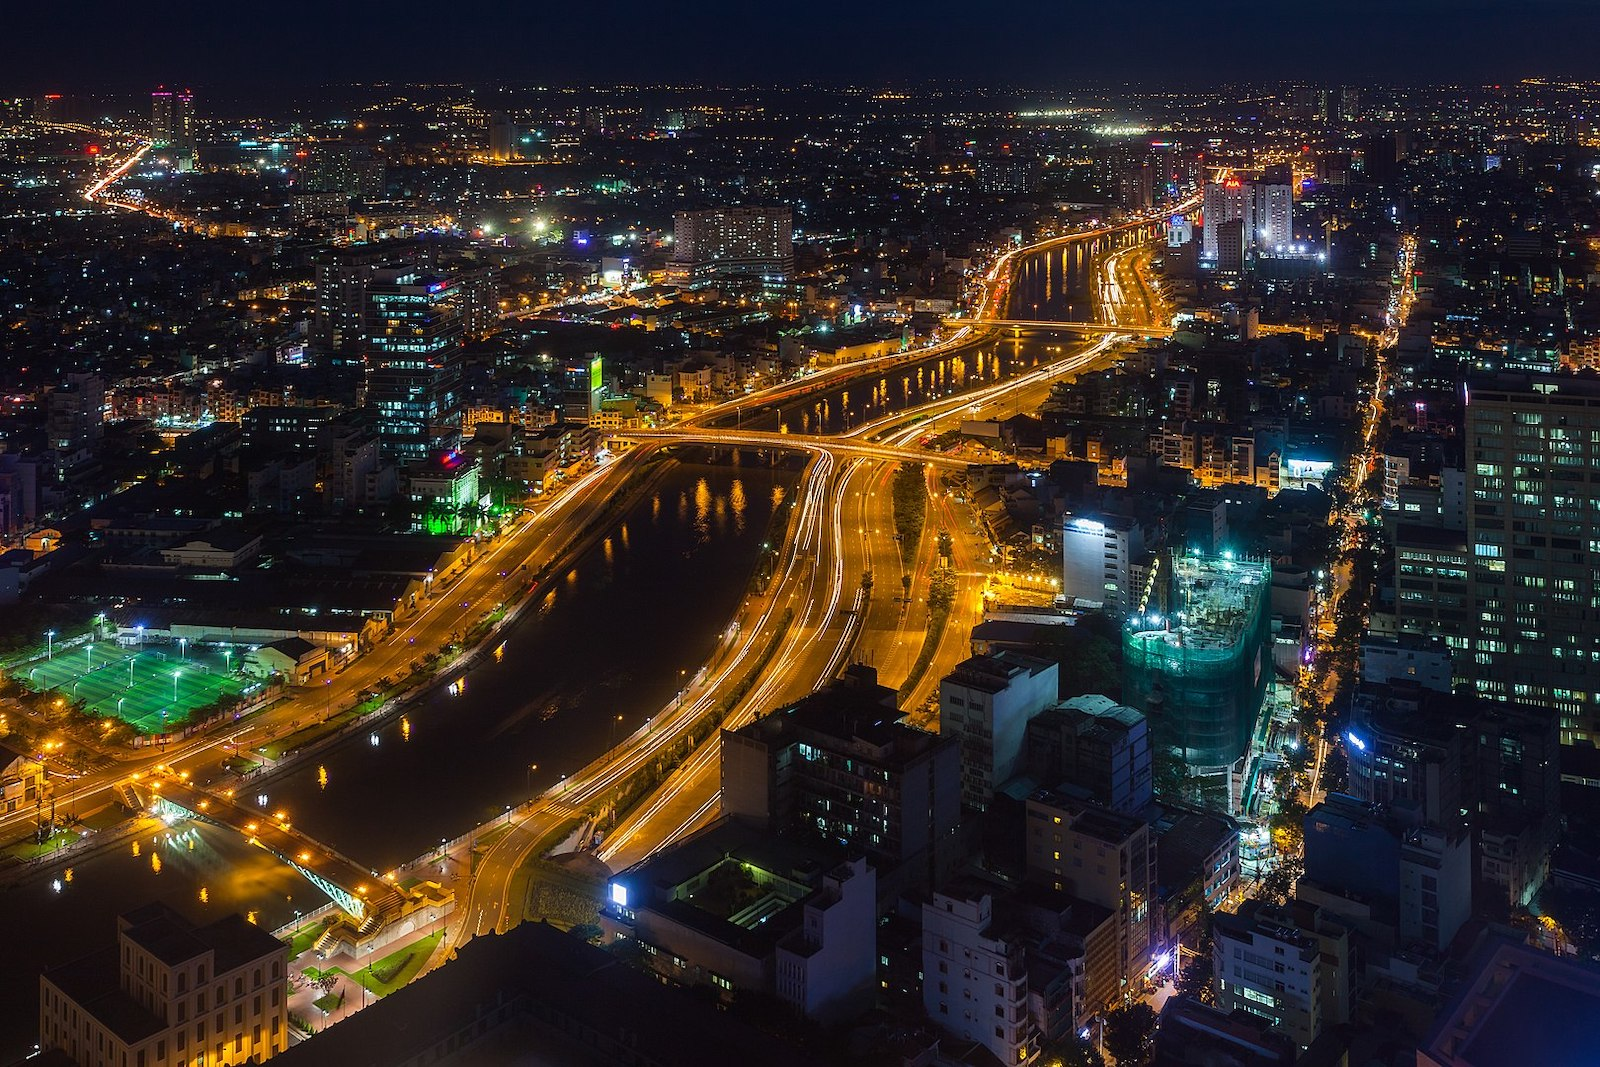 Image of Saigon at night